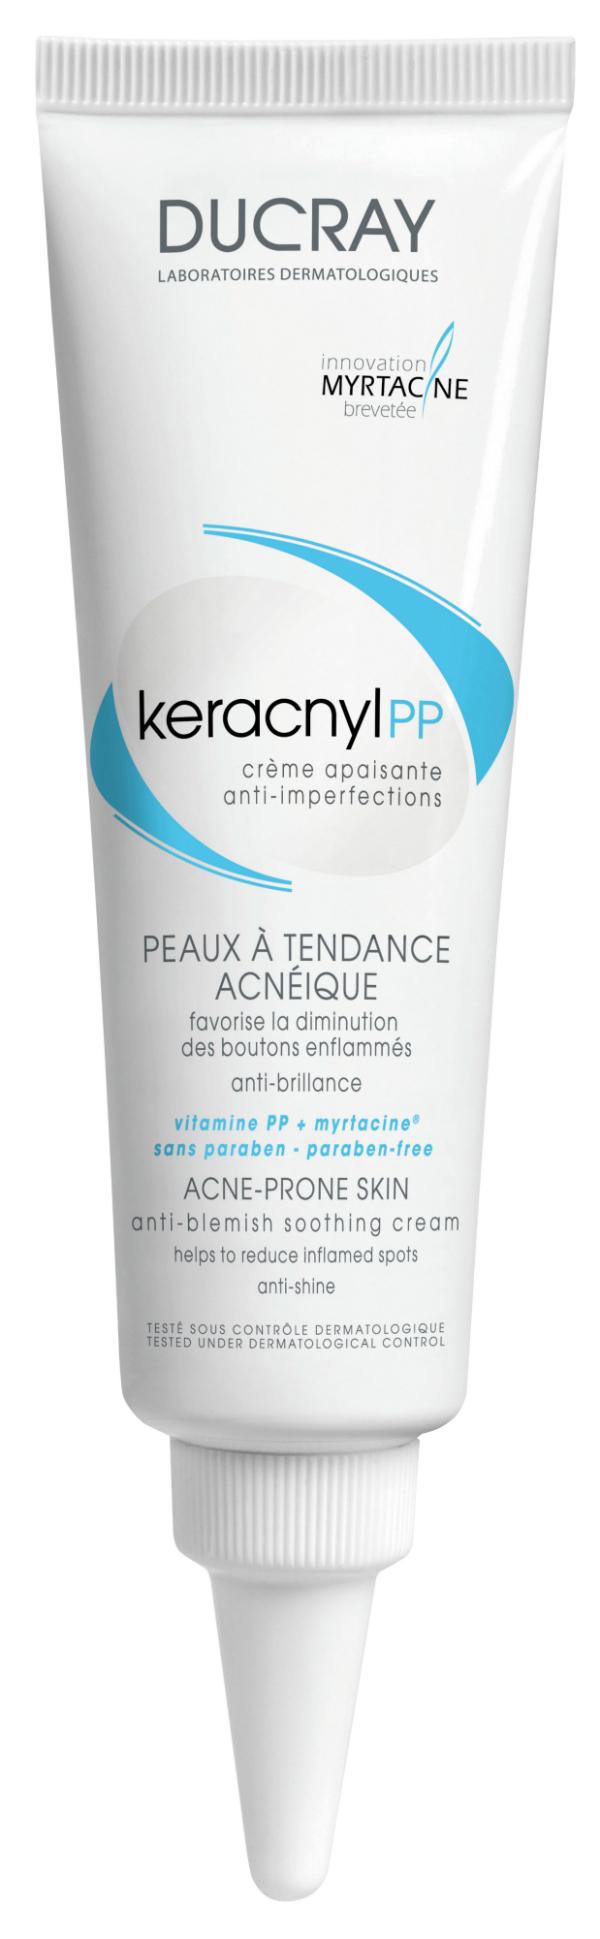 keranyl-pp-nlletube-600-px